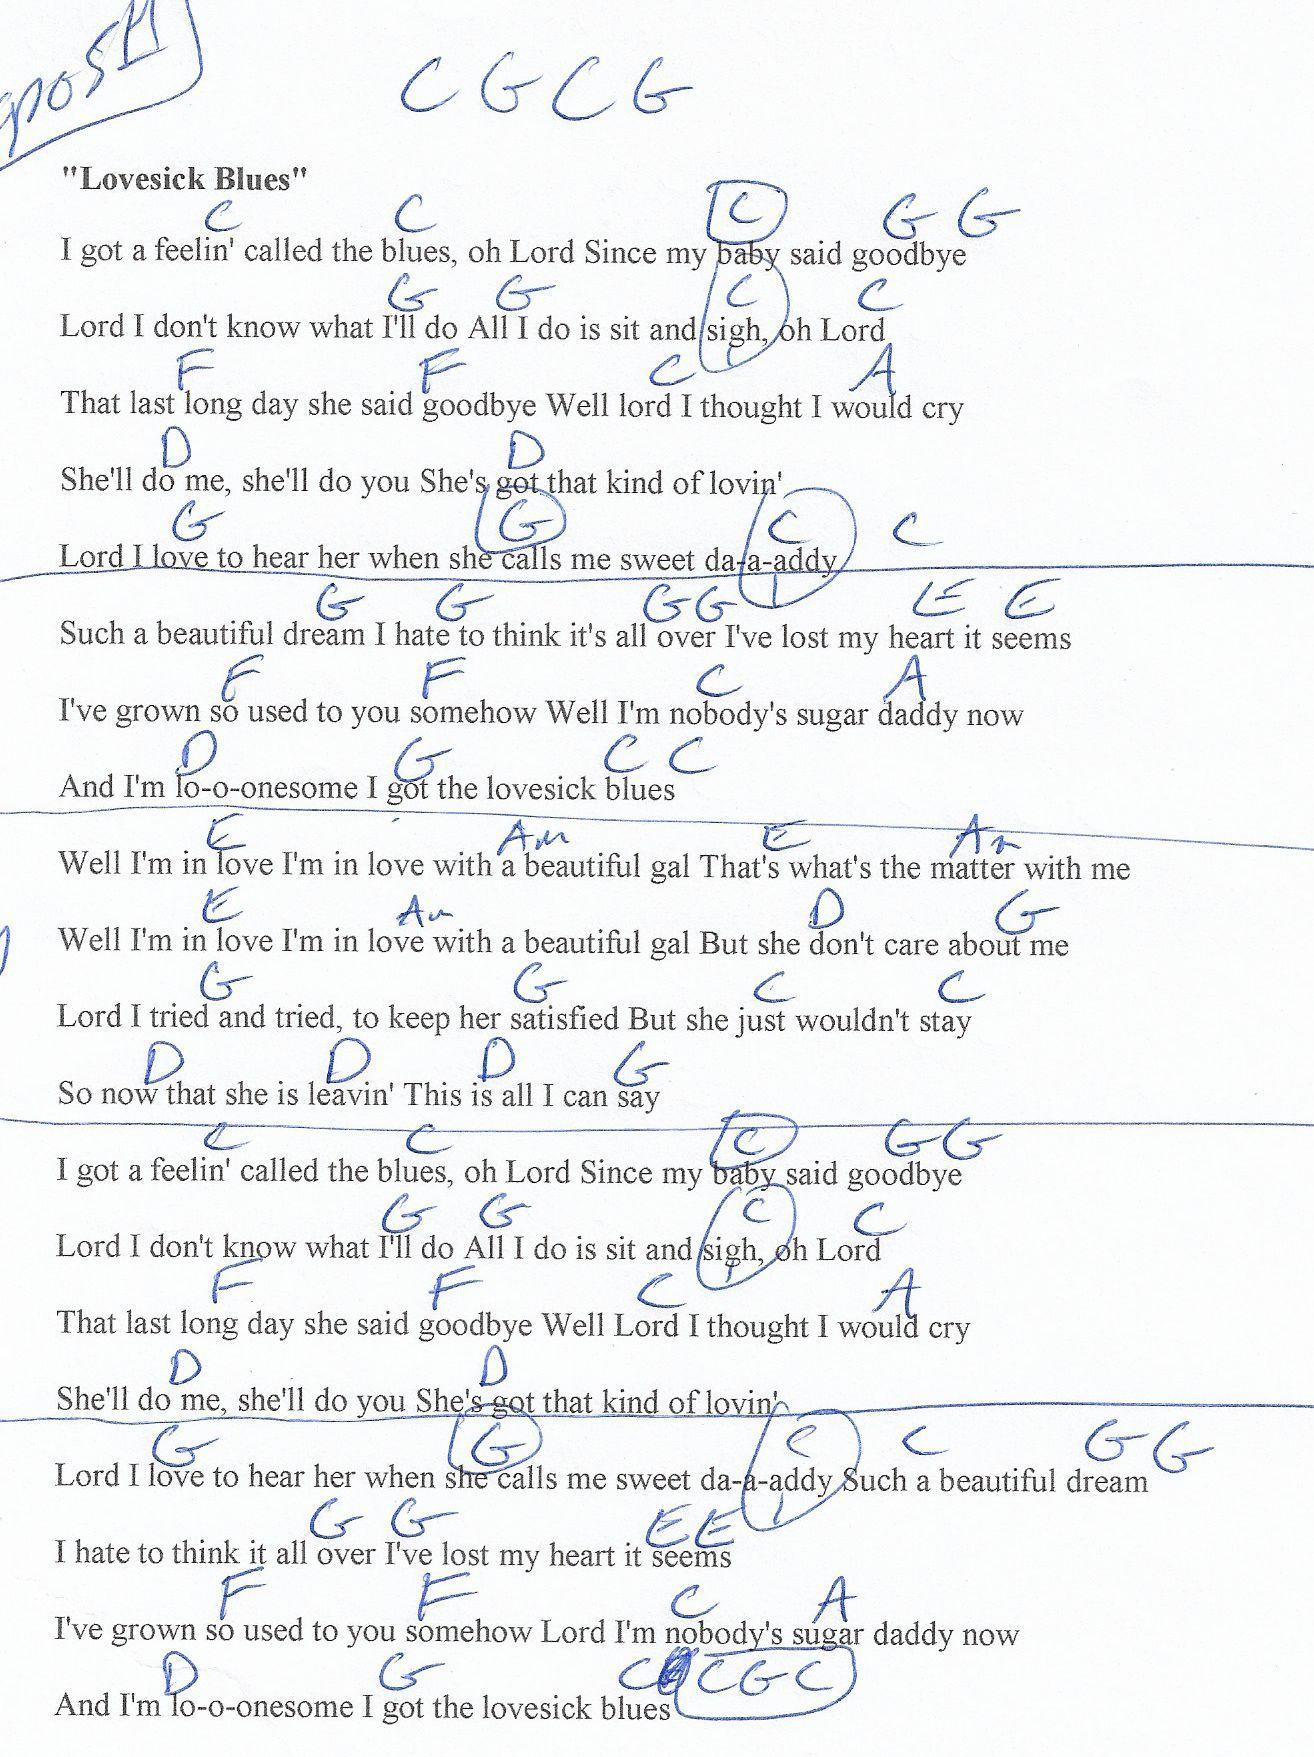 Lovesick Blues Hank Williams Guitar Chord Chart Capo 5th